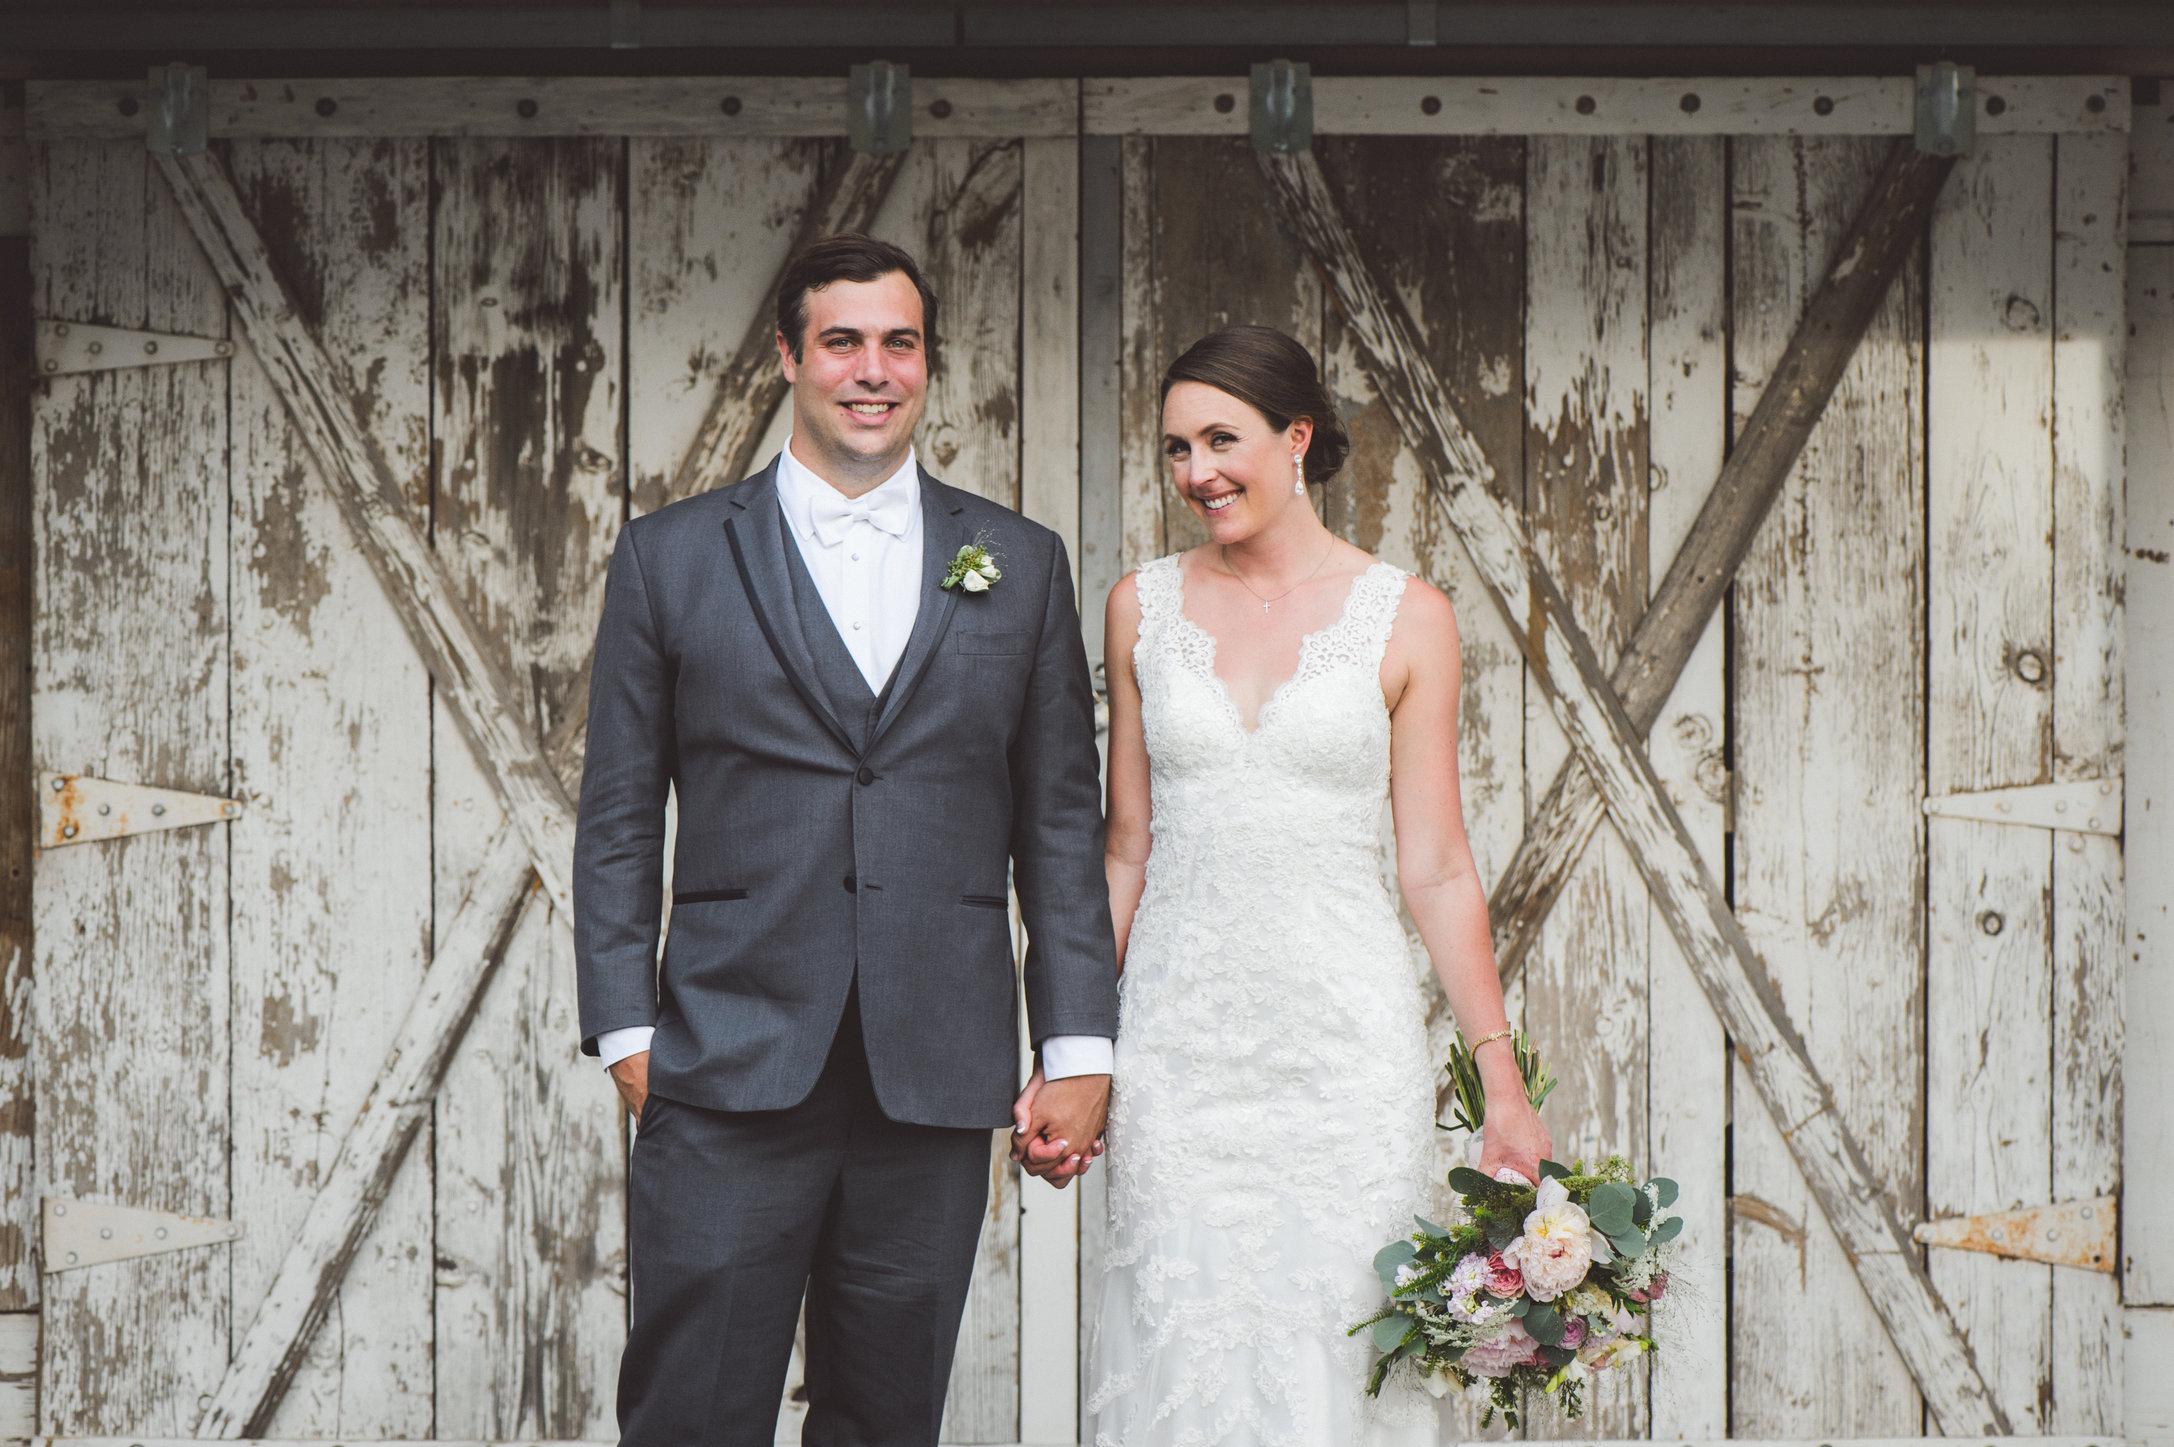 SandC-wedding-564.jpg